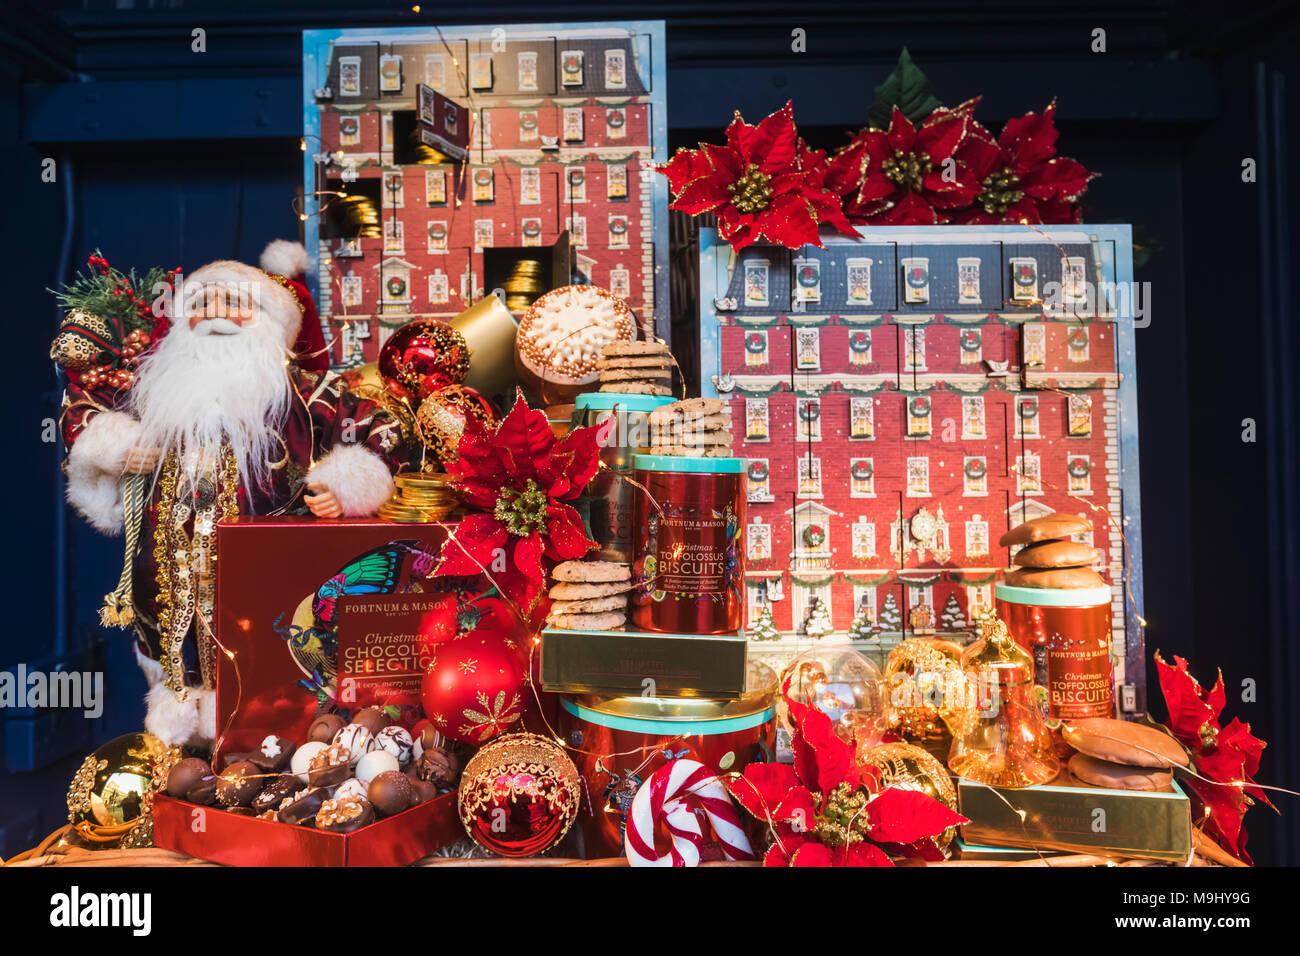 England London Piccadilly Fortnum Mason Store Christmas Window